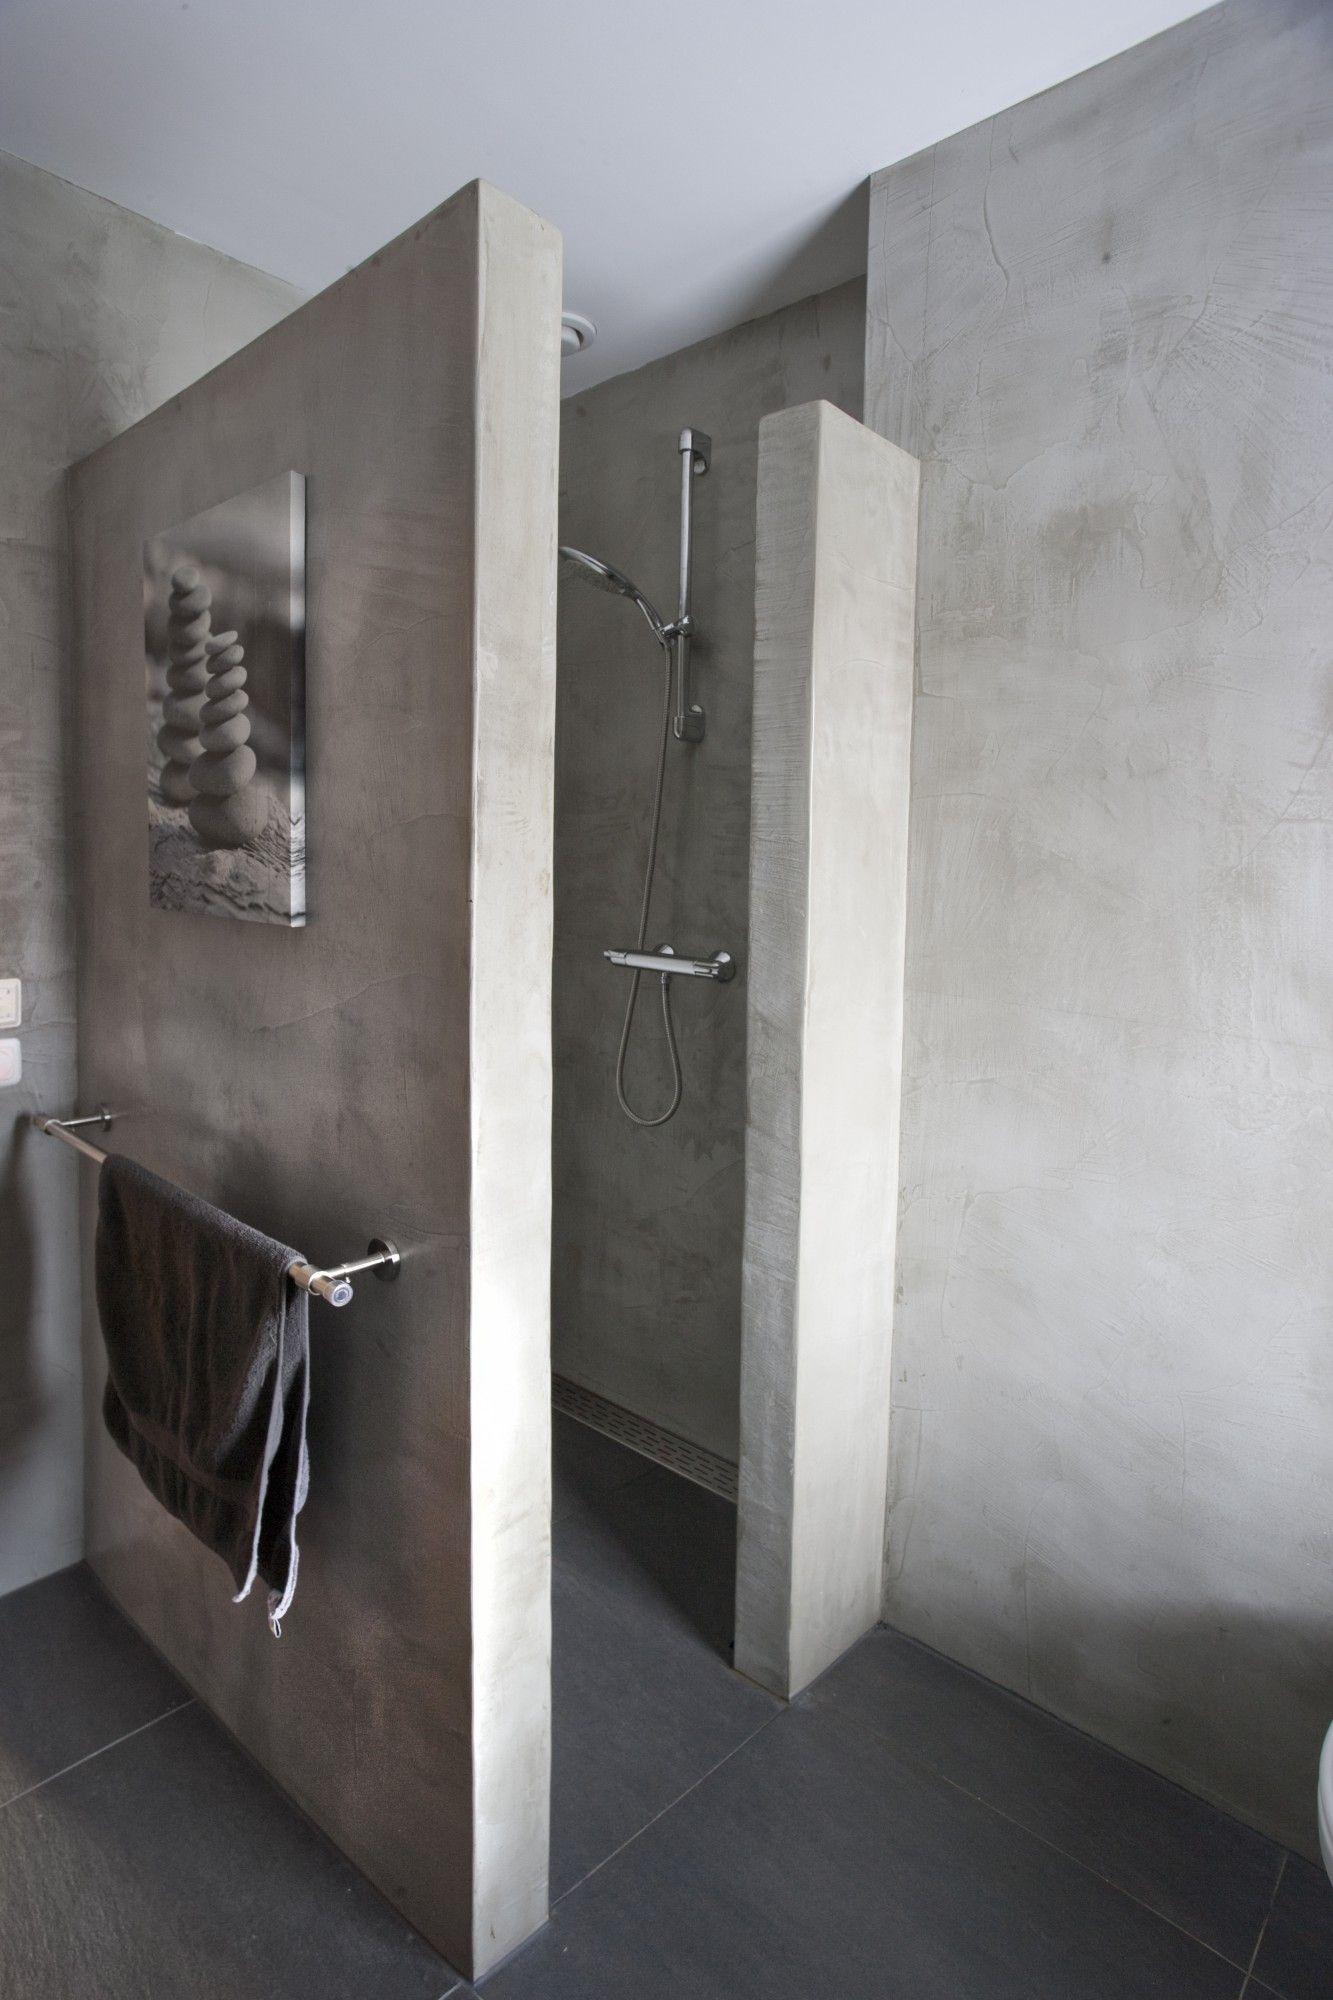 Pin by A Stegman on The Boys | Pinterest | Bathroom inspiration ...